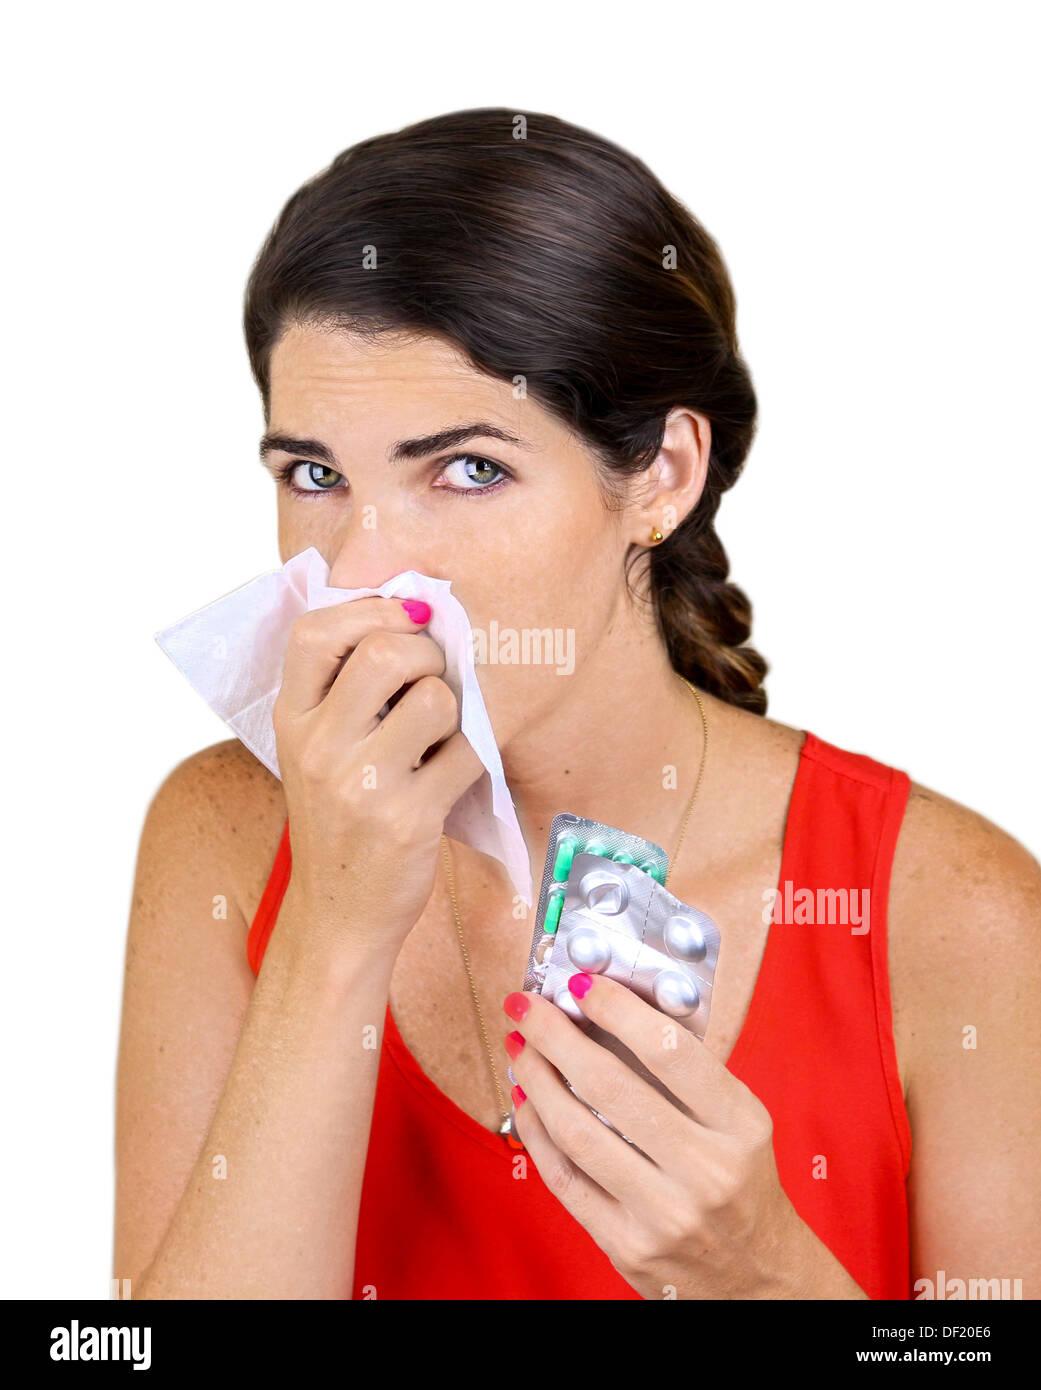 Got the Flu - Stock Image